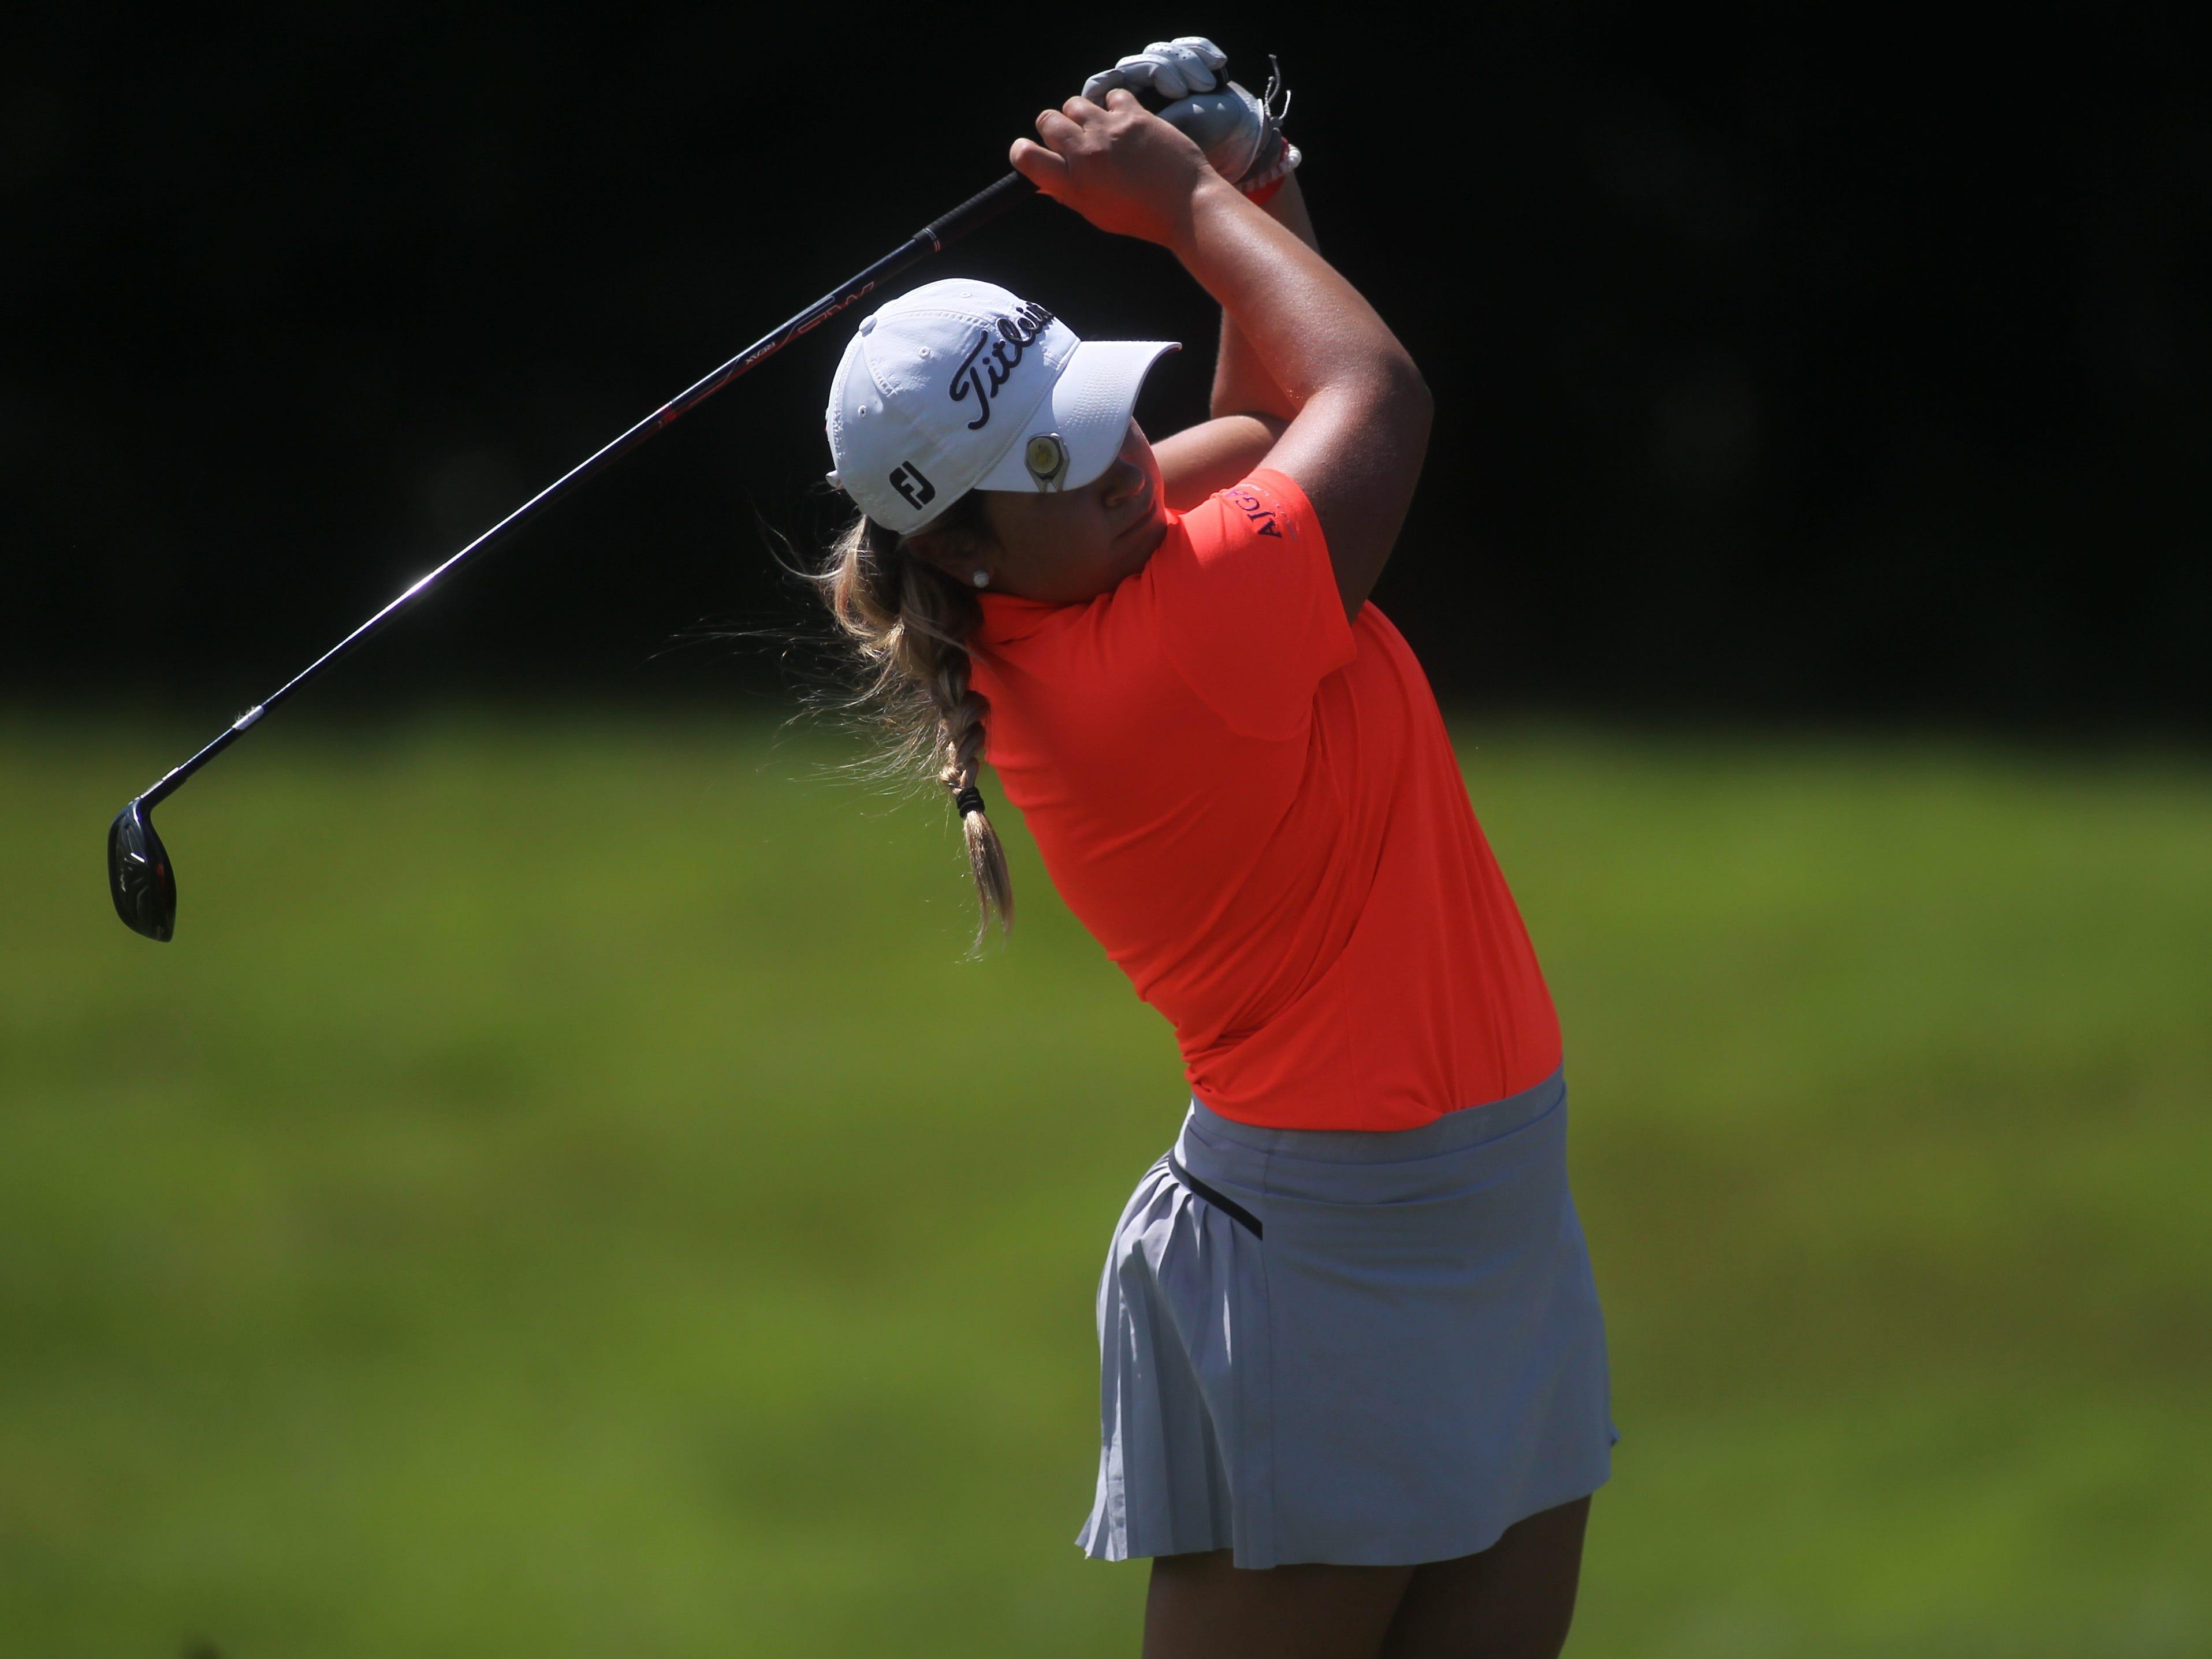 Aucilla Christian senior Megan Schofill plays a round Monday at Southwood Golf Club.